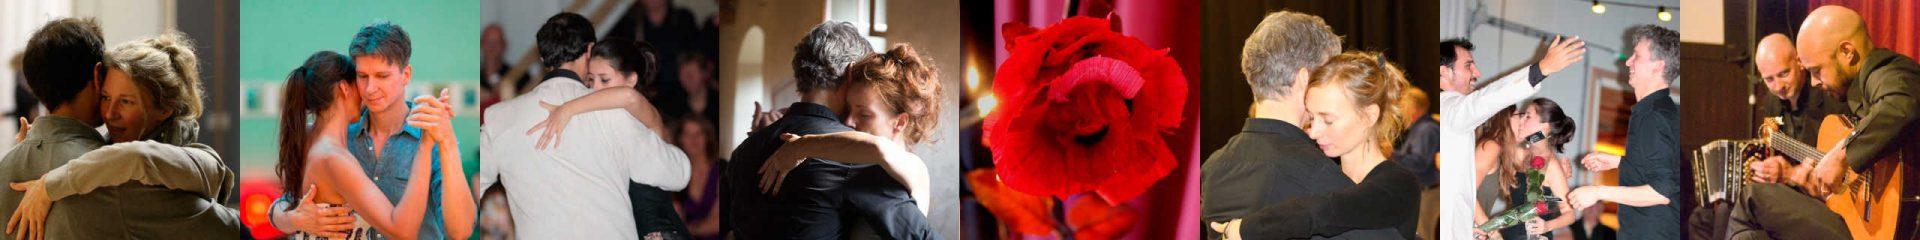 tango-images